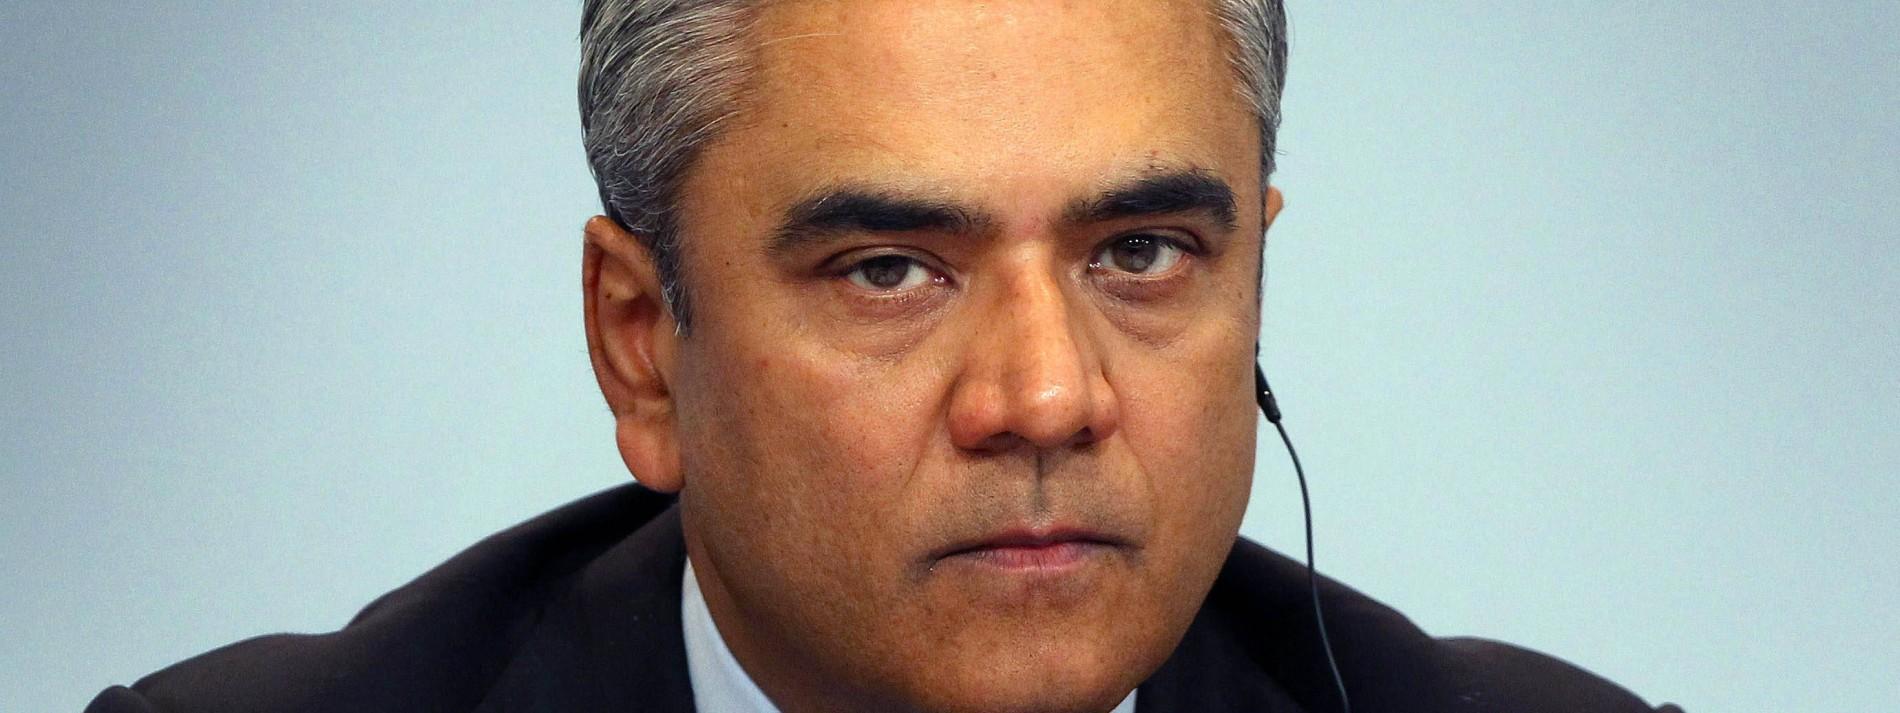 Anshu Jain geht ins Silicon Valley